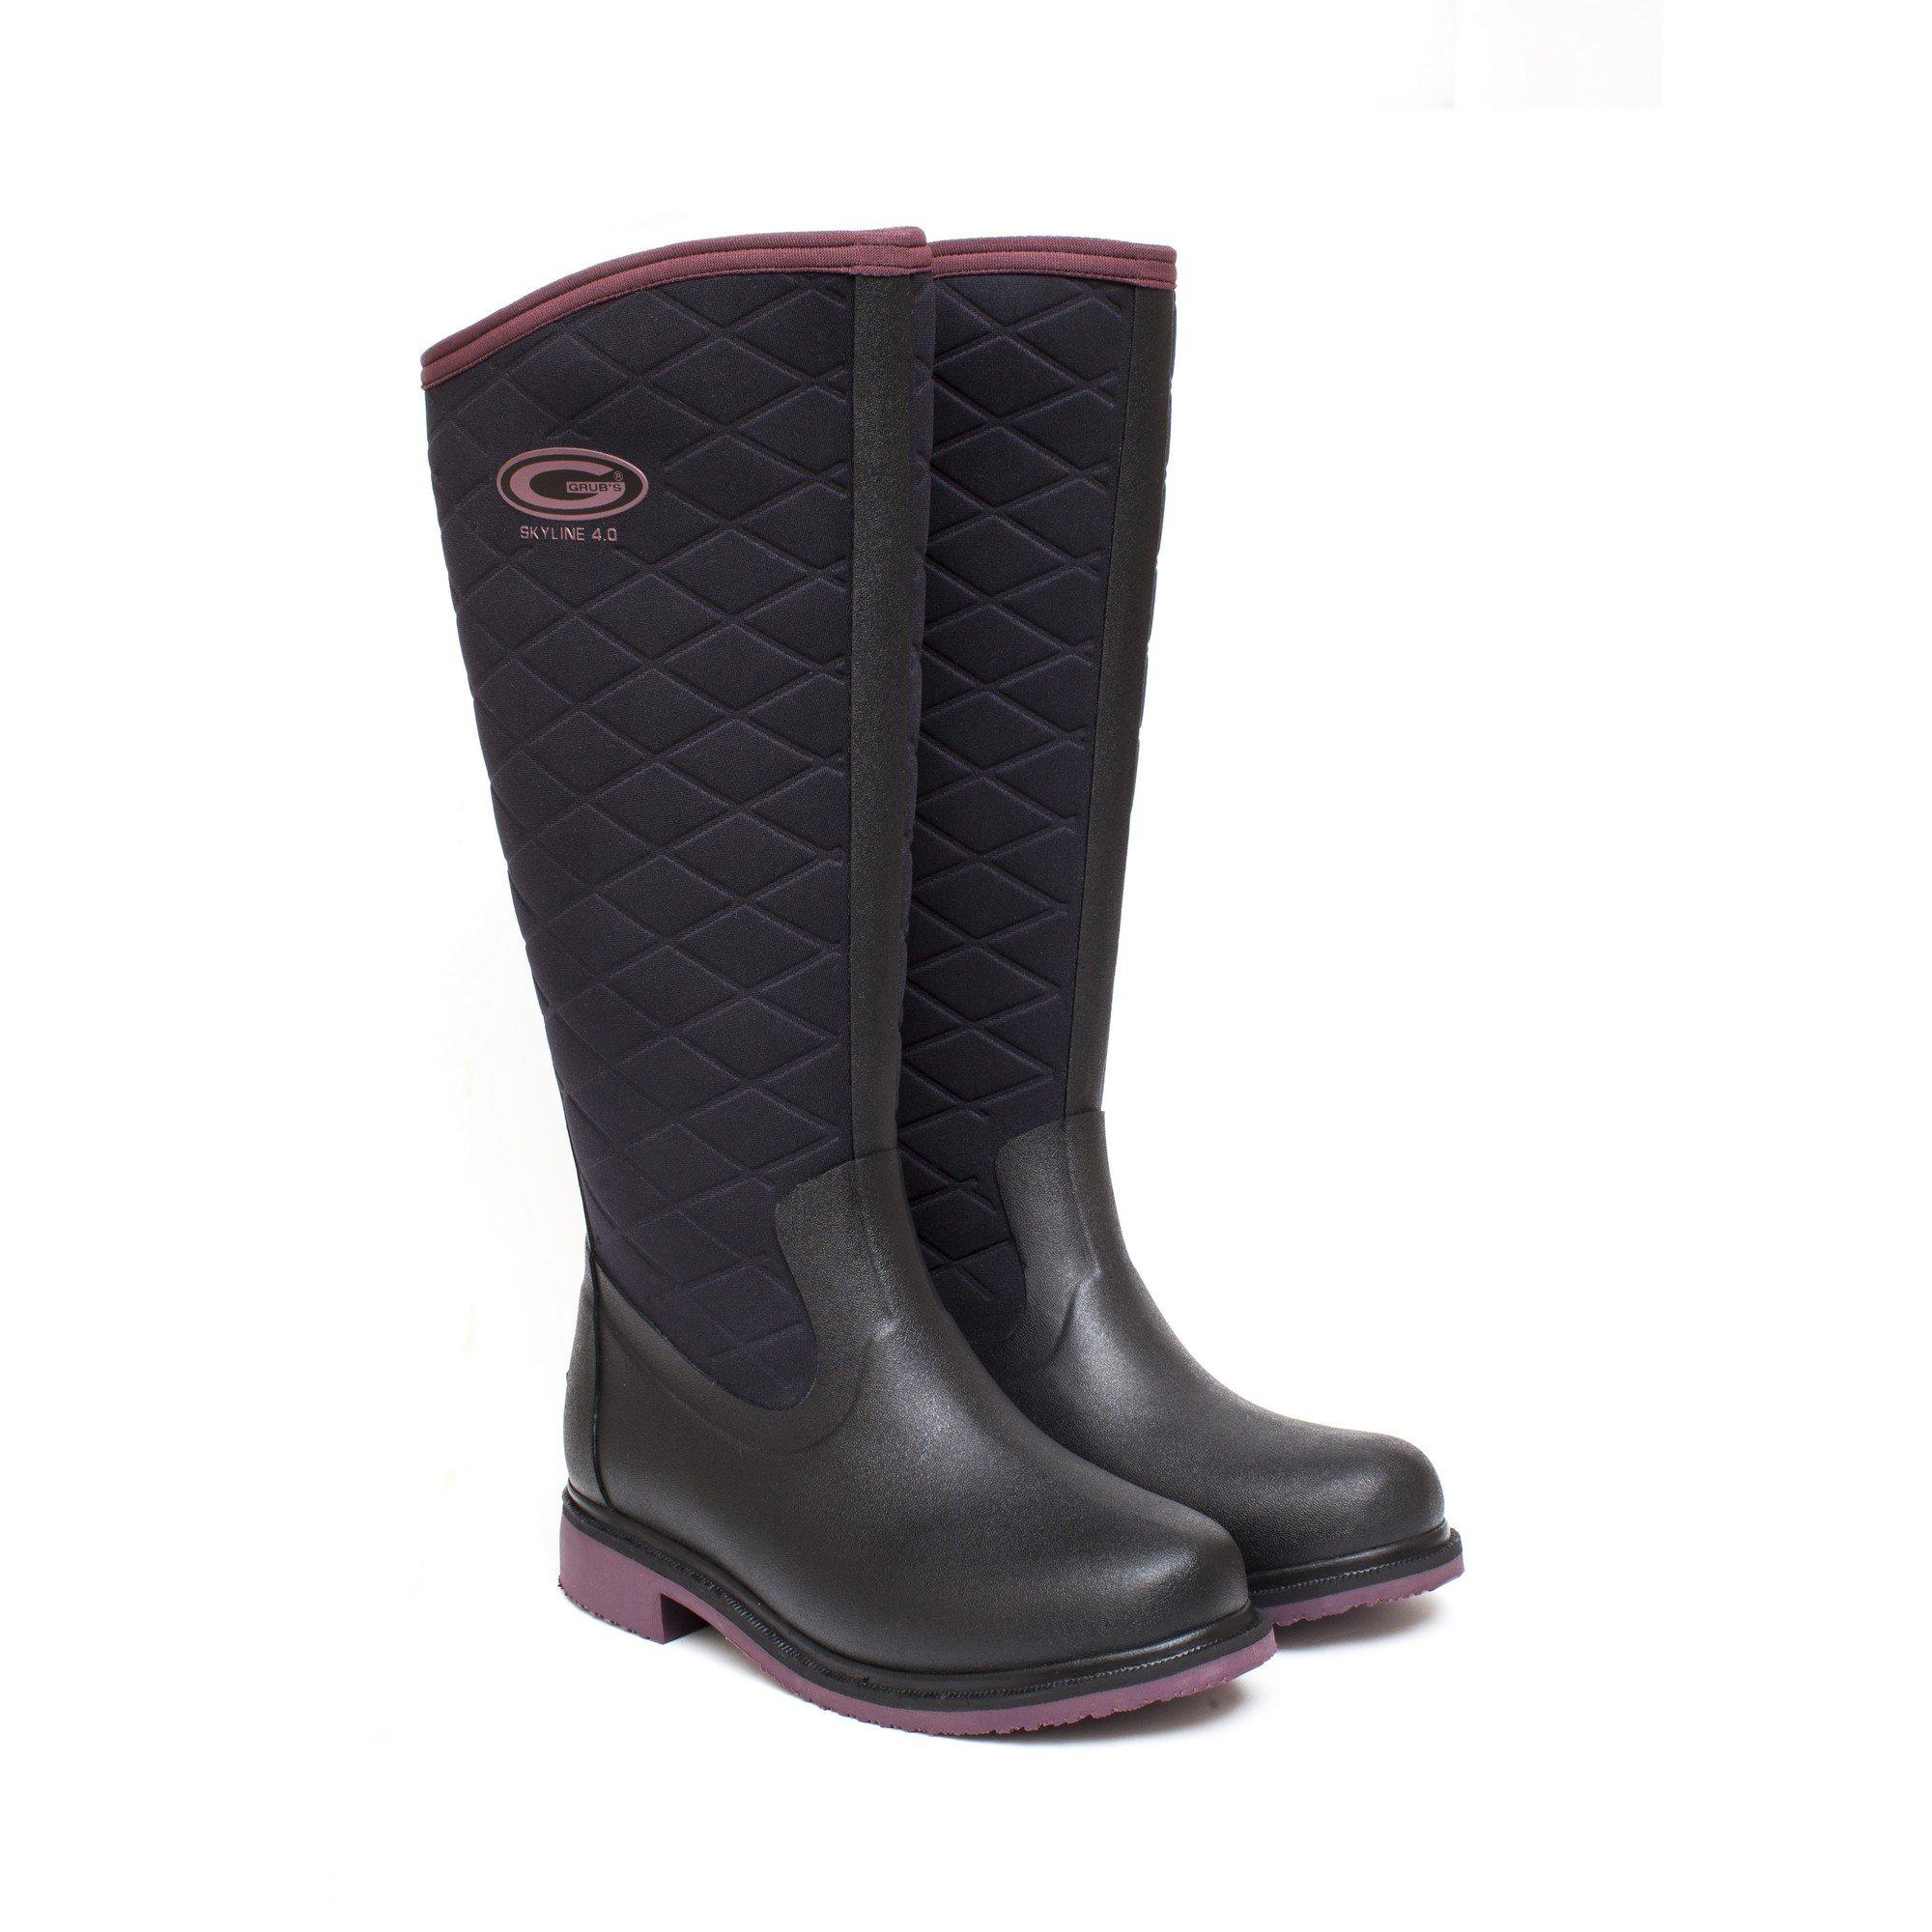 Grubs Womens/Ladies Skyline Boots (10 US) (Black/Heather)